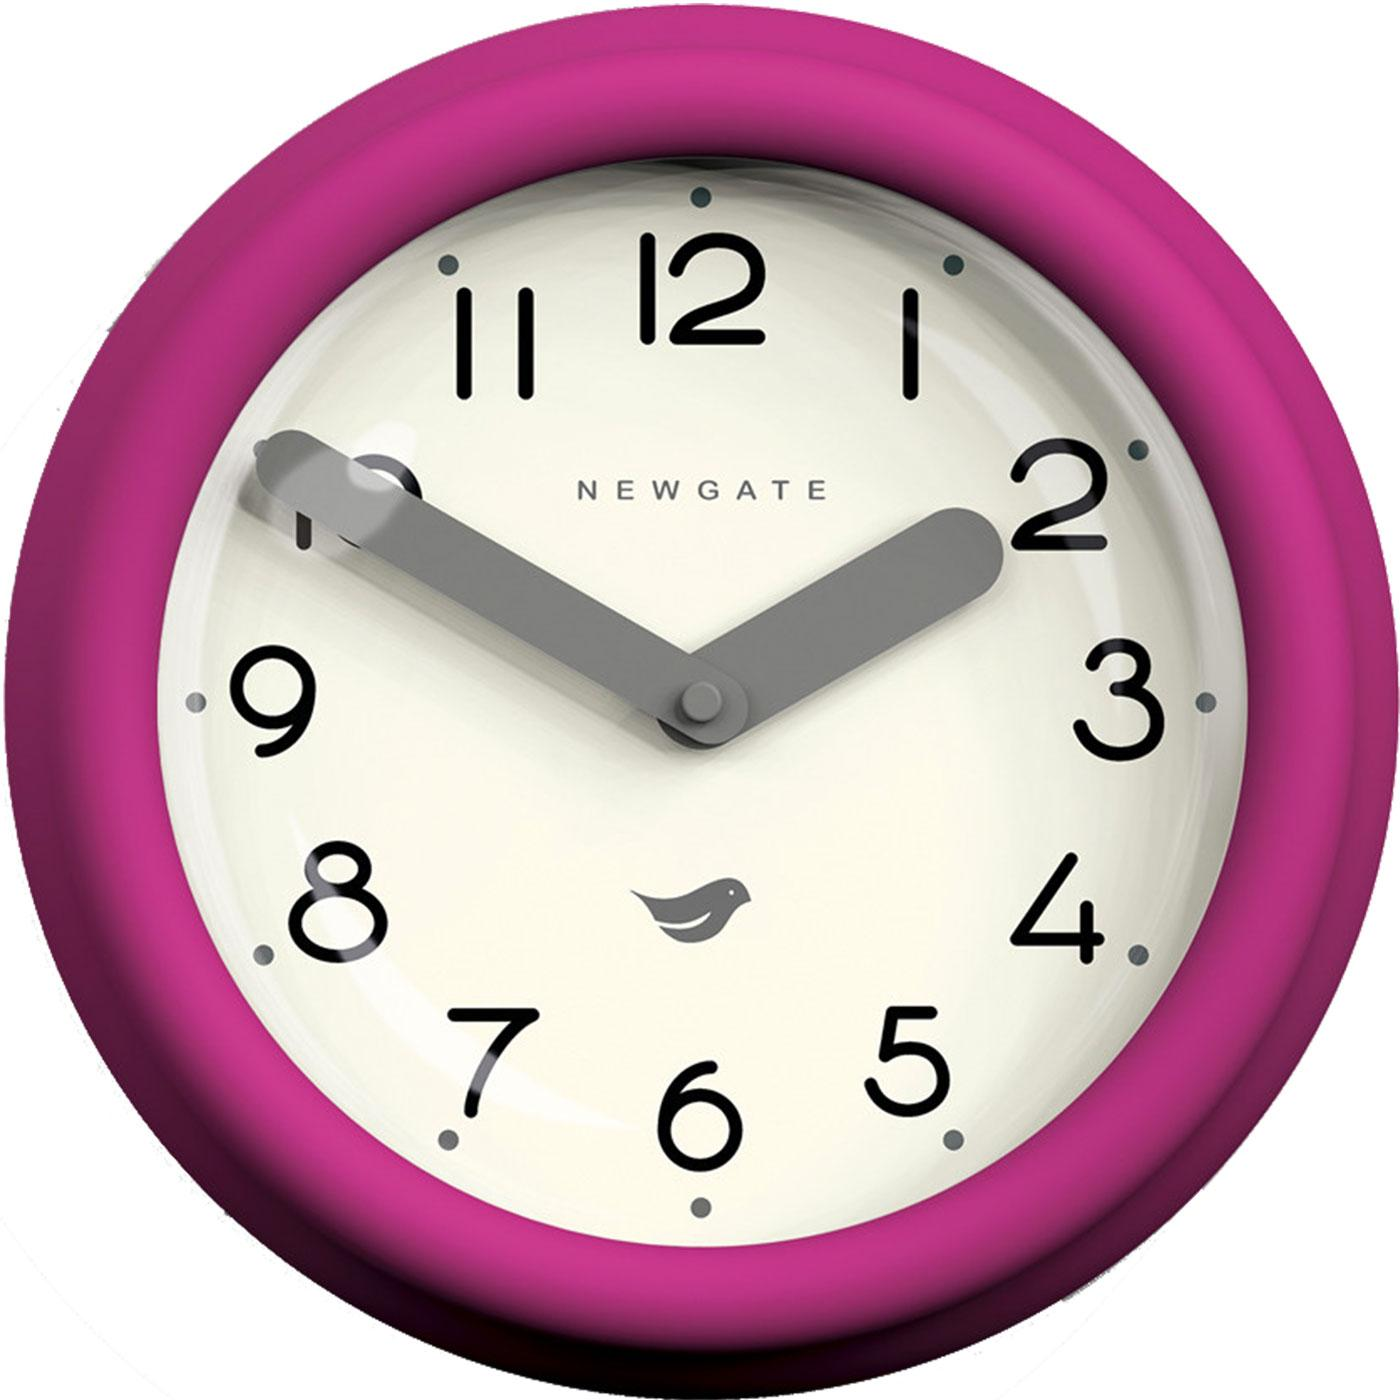 Pantry NEWGATE CLOCKS Retro Wall Clock in Hot Pink